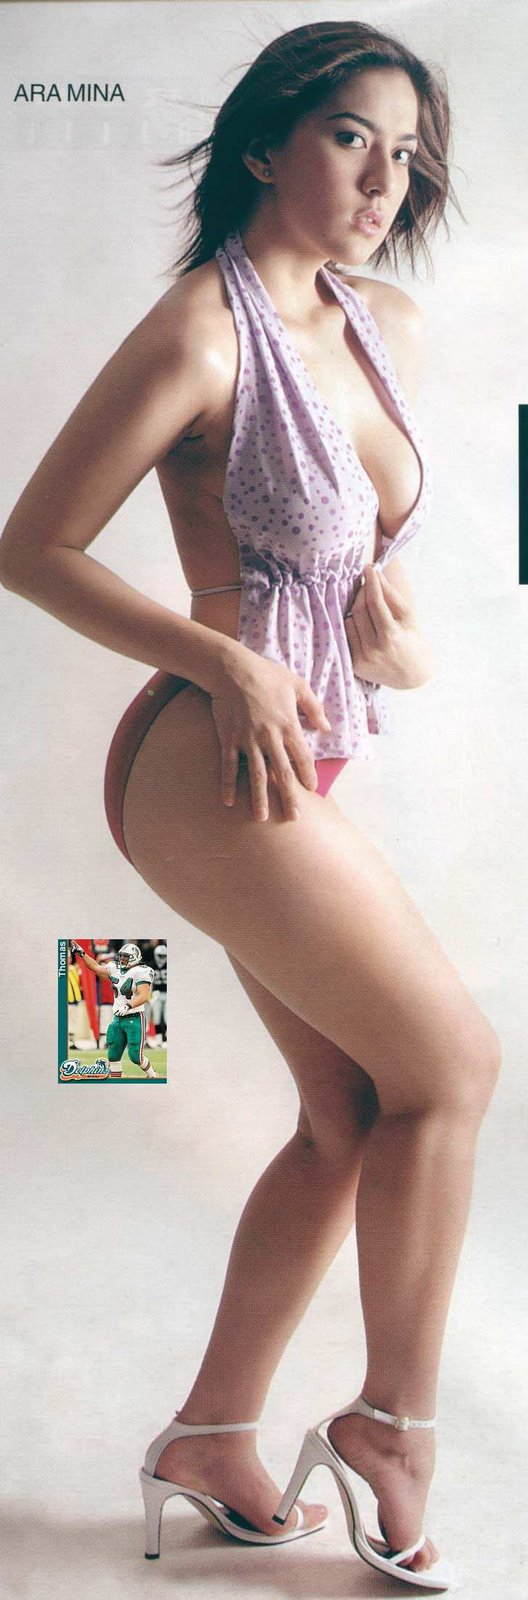 Ara Mina Naked Body ara mina sexy girl - hot girls